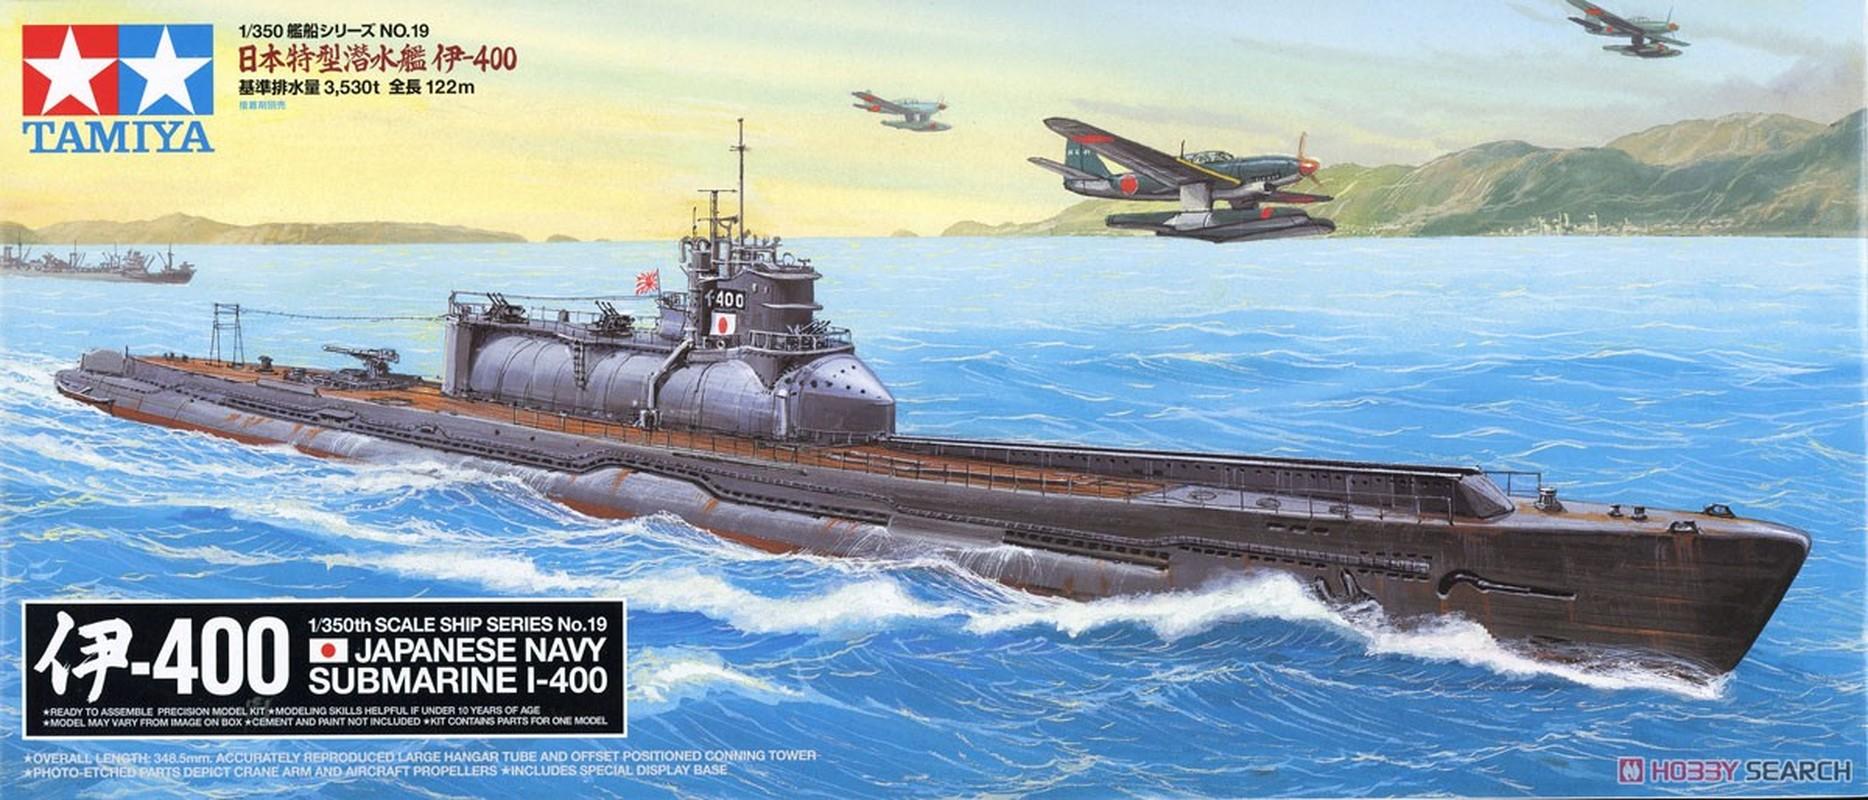 Nhat tung thiet ke may bay nem bom bay duoc nua vong Trai Dat-Hinh-3